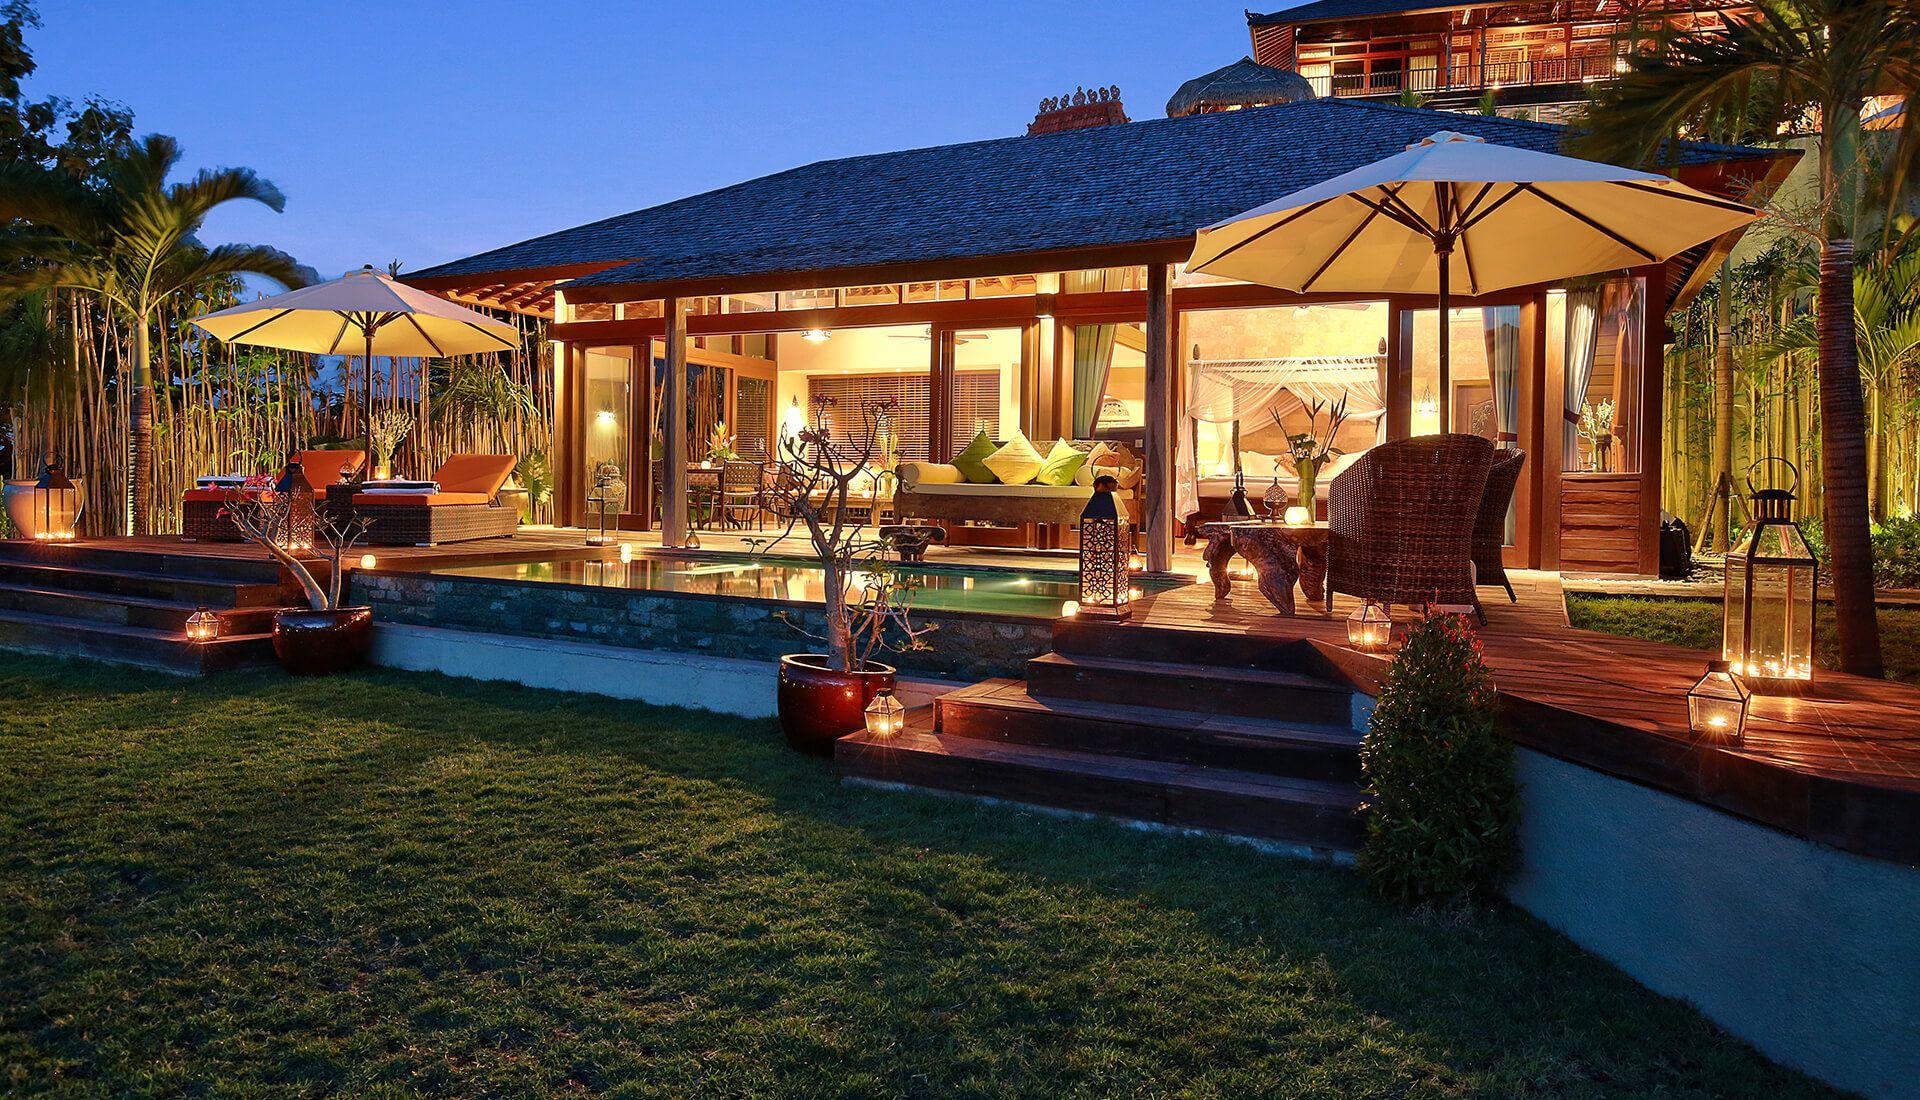 Bali Wedding Venue Uluwatu Romantic Villa Marrakesh Hidden Hills In 2020 Beautiful Villas Villa Bali